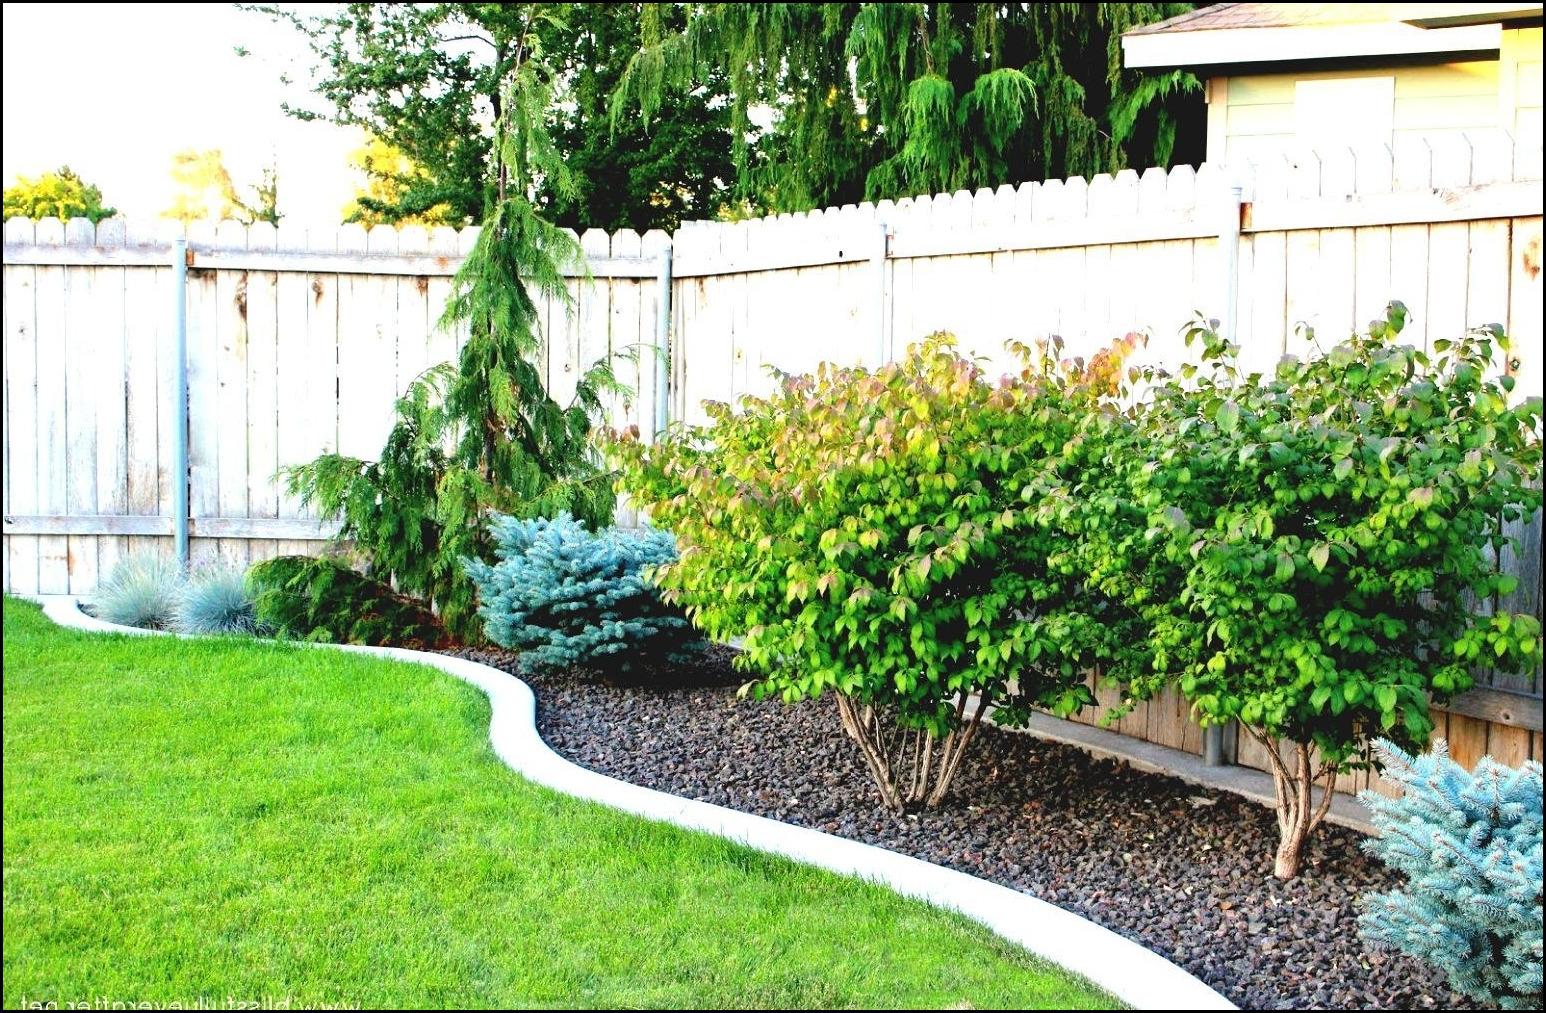 Easy Backyard Landscaping Ideas For Beginners In Square: Easy Landscaping Ideas For Beginners